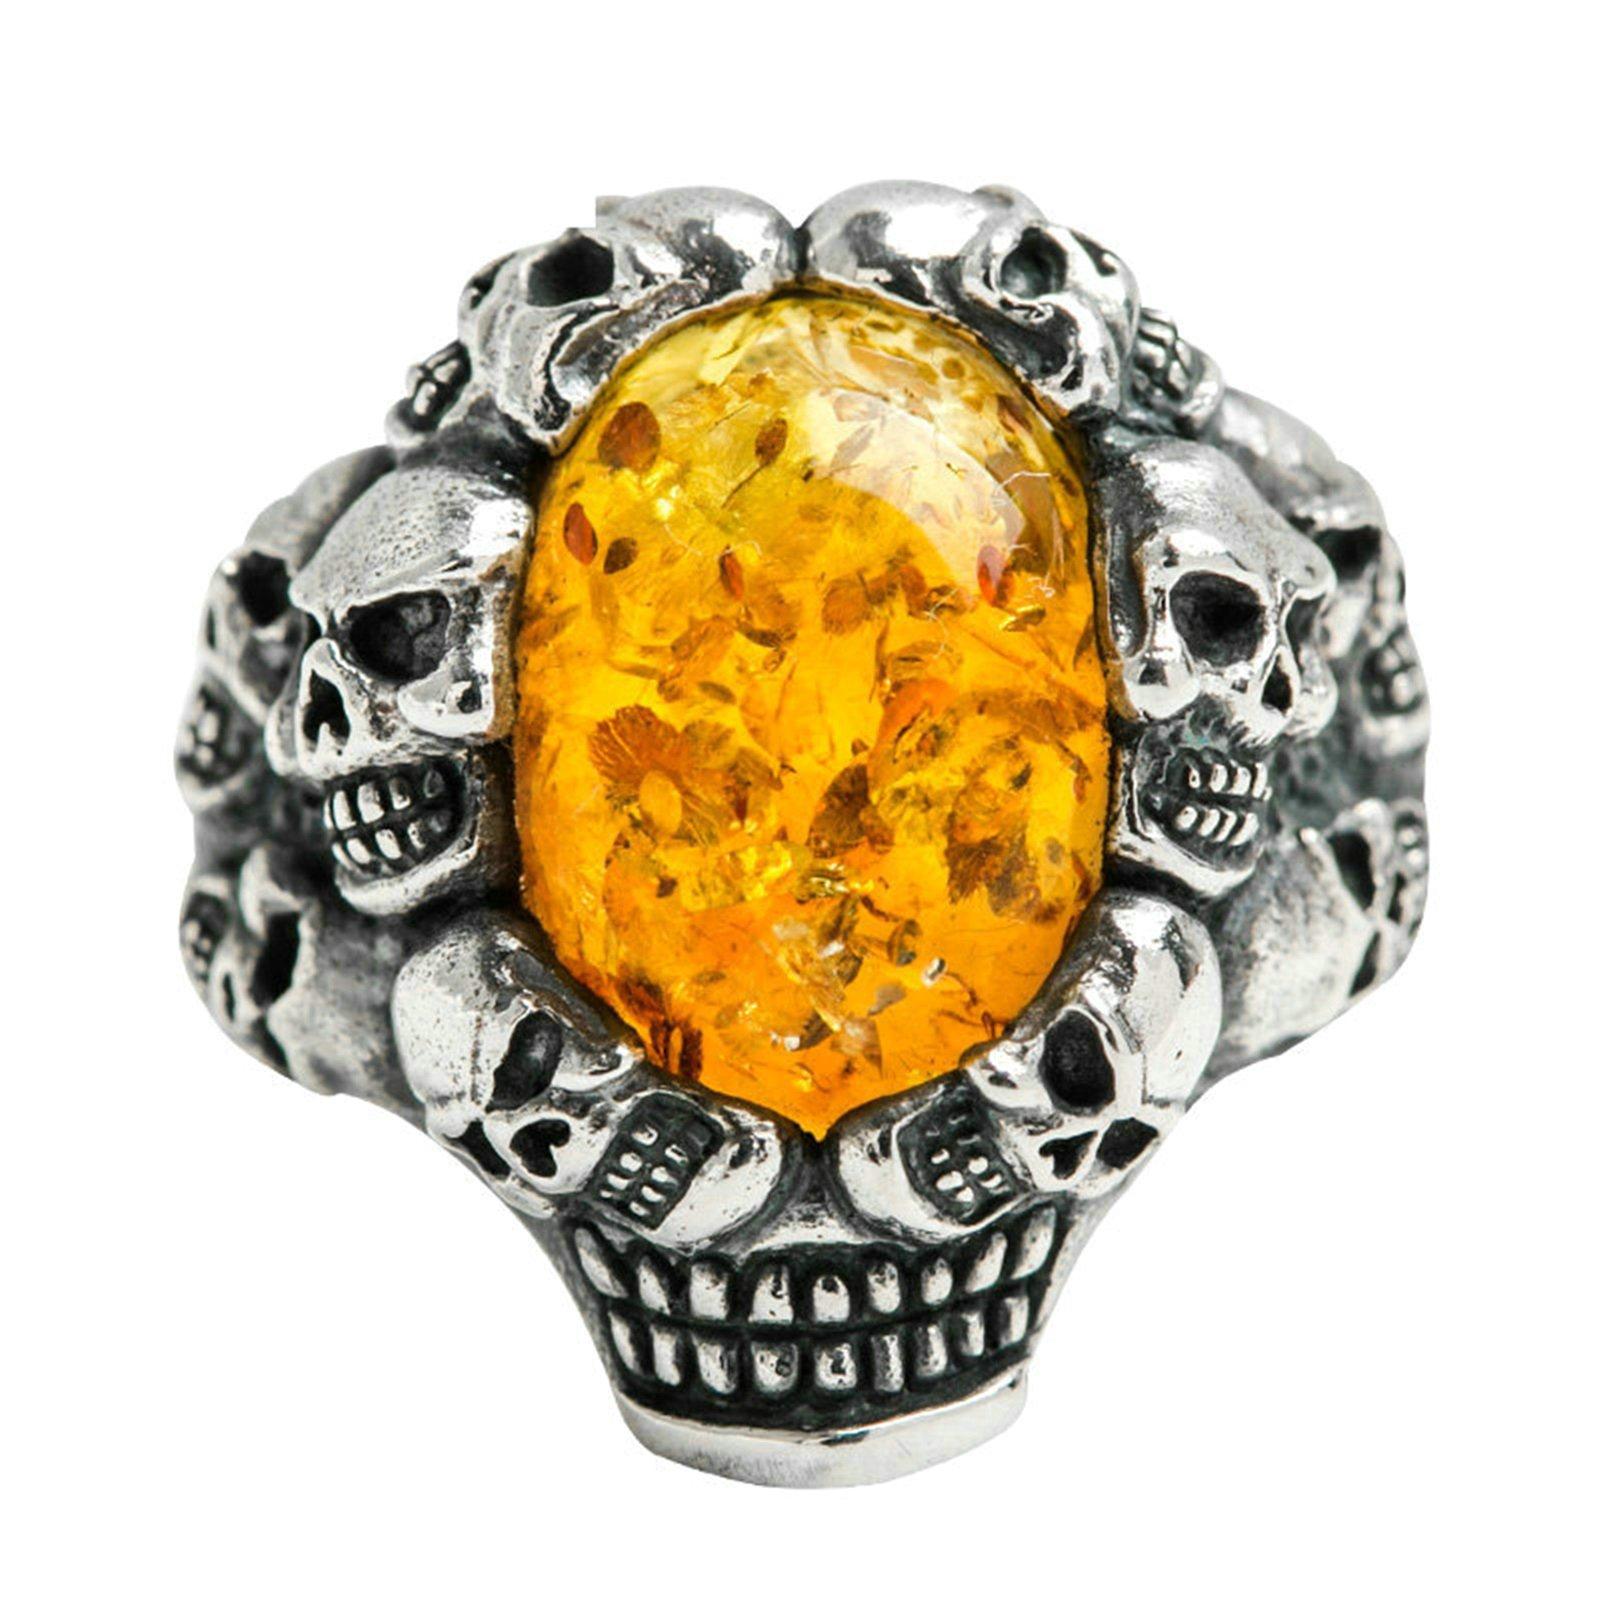 Adisaer Biker Rings Silver Ring for Men Skull Amber Ring Size 10.5 Vintage Punk Jewelry